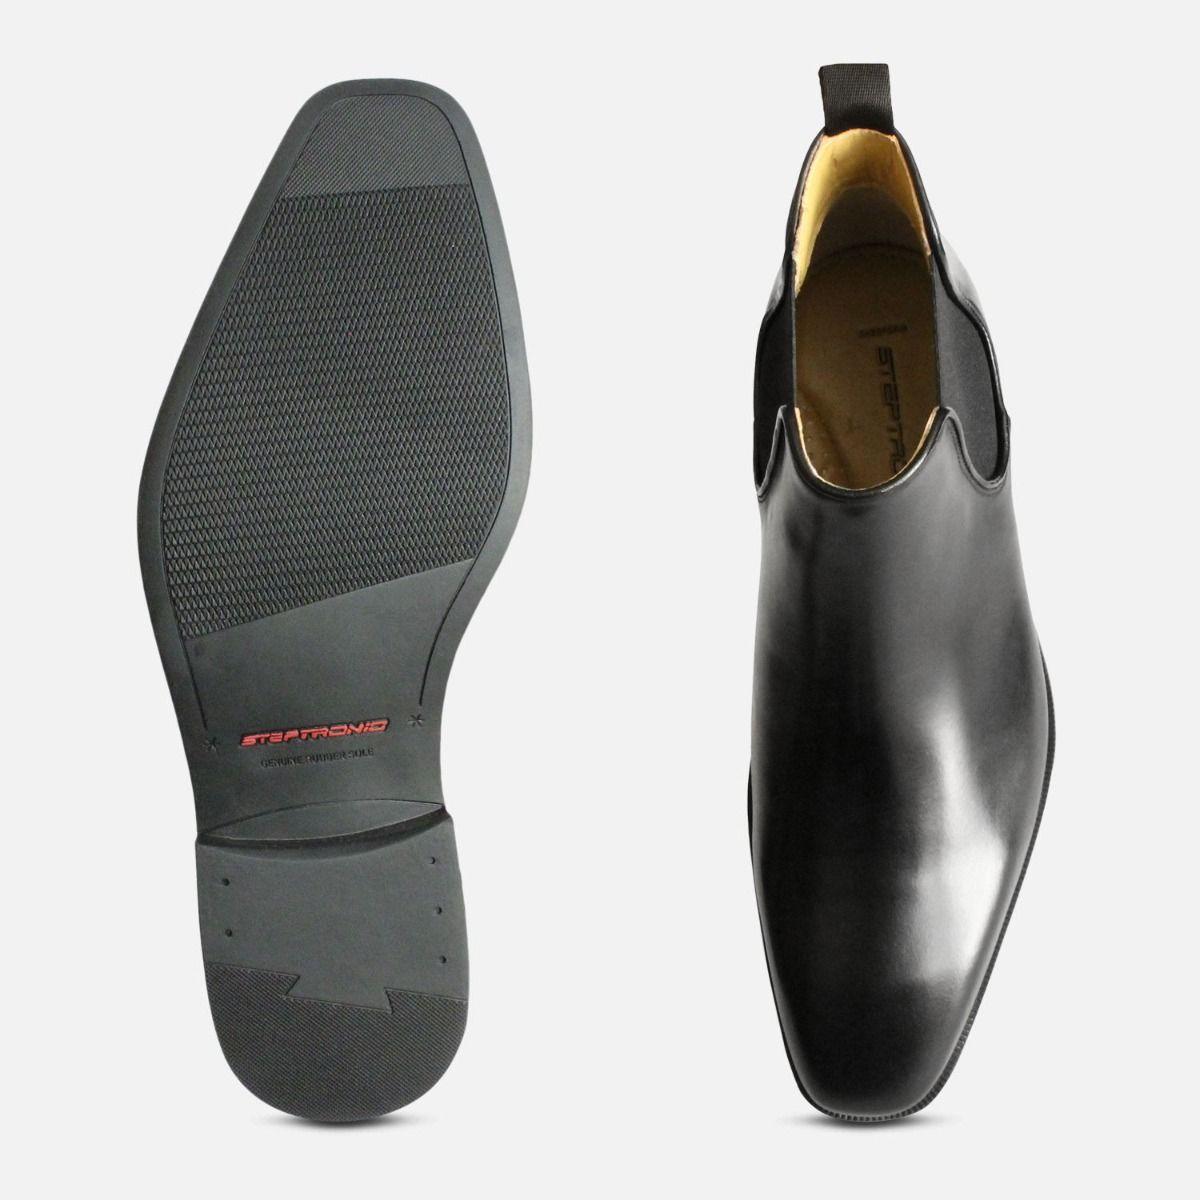 Chisel Toe Chelsea Boots Steptronic Hogan in Black